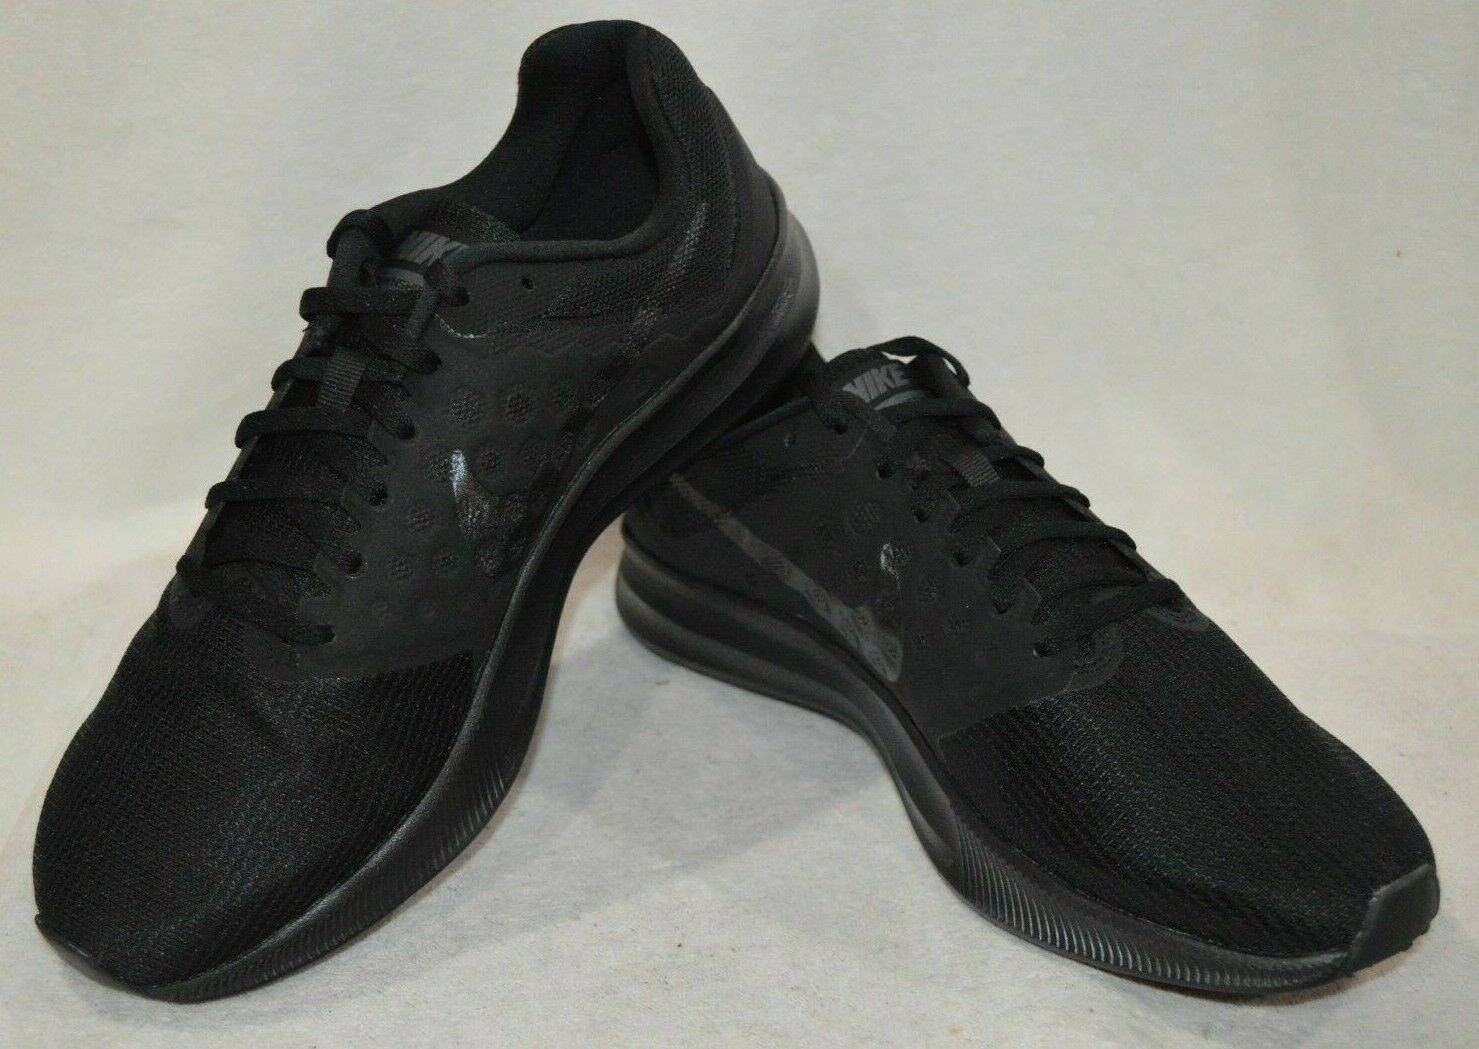 Nike Men's Downshifter 7 Black Metallic Hematite A Running shoes-Asst Sizes NWB